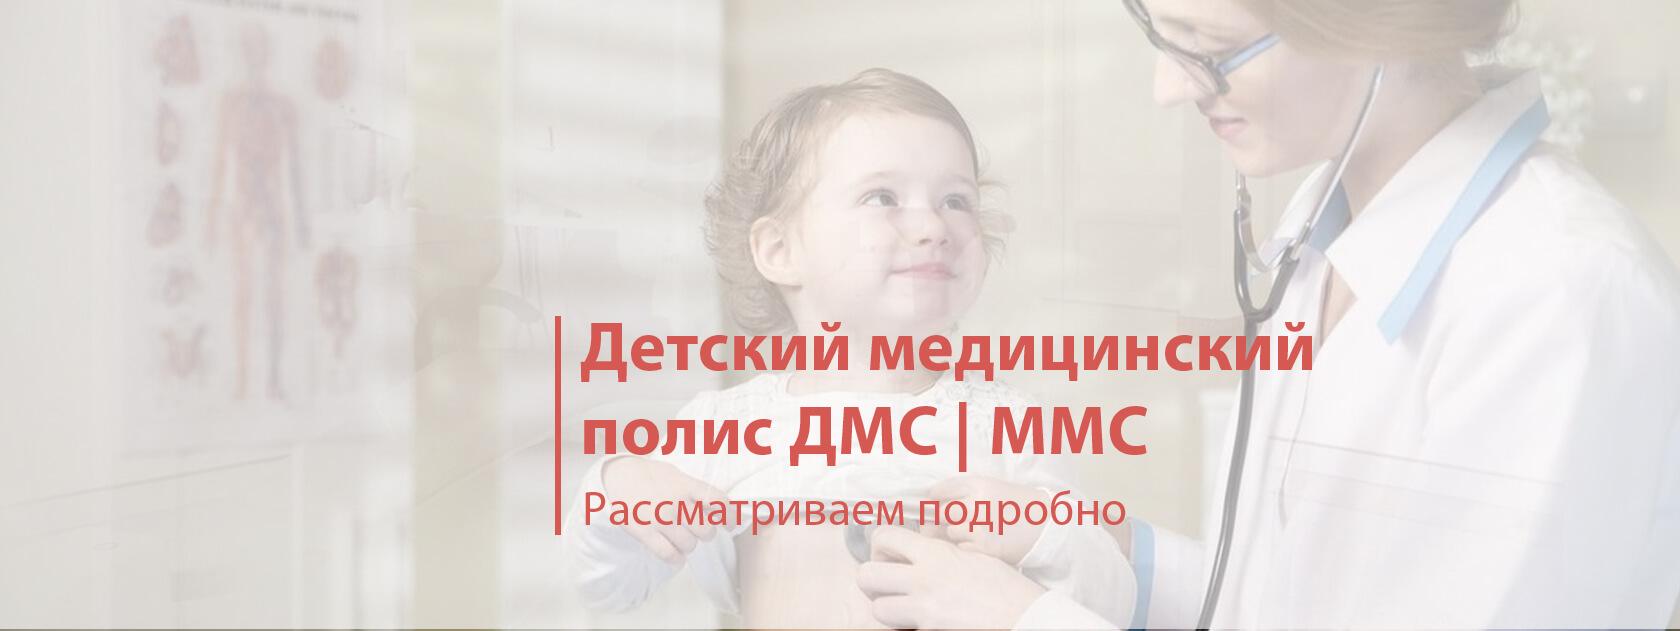 Детский медицинский полис ДМС / ММС